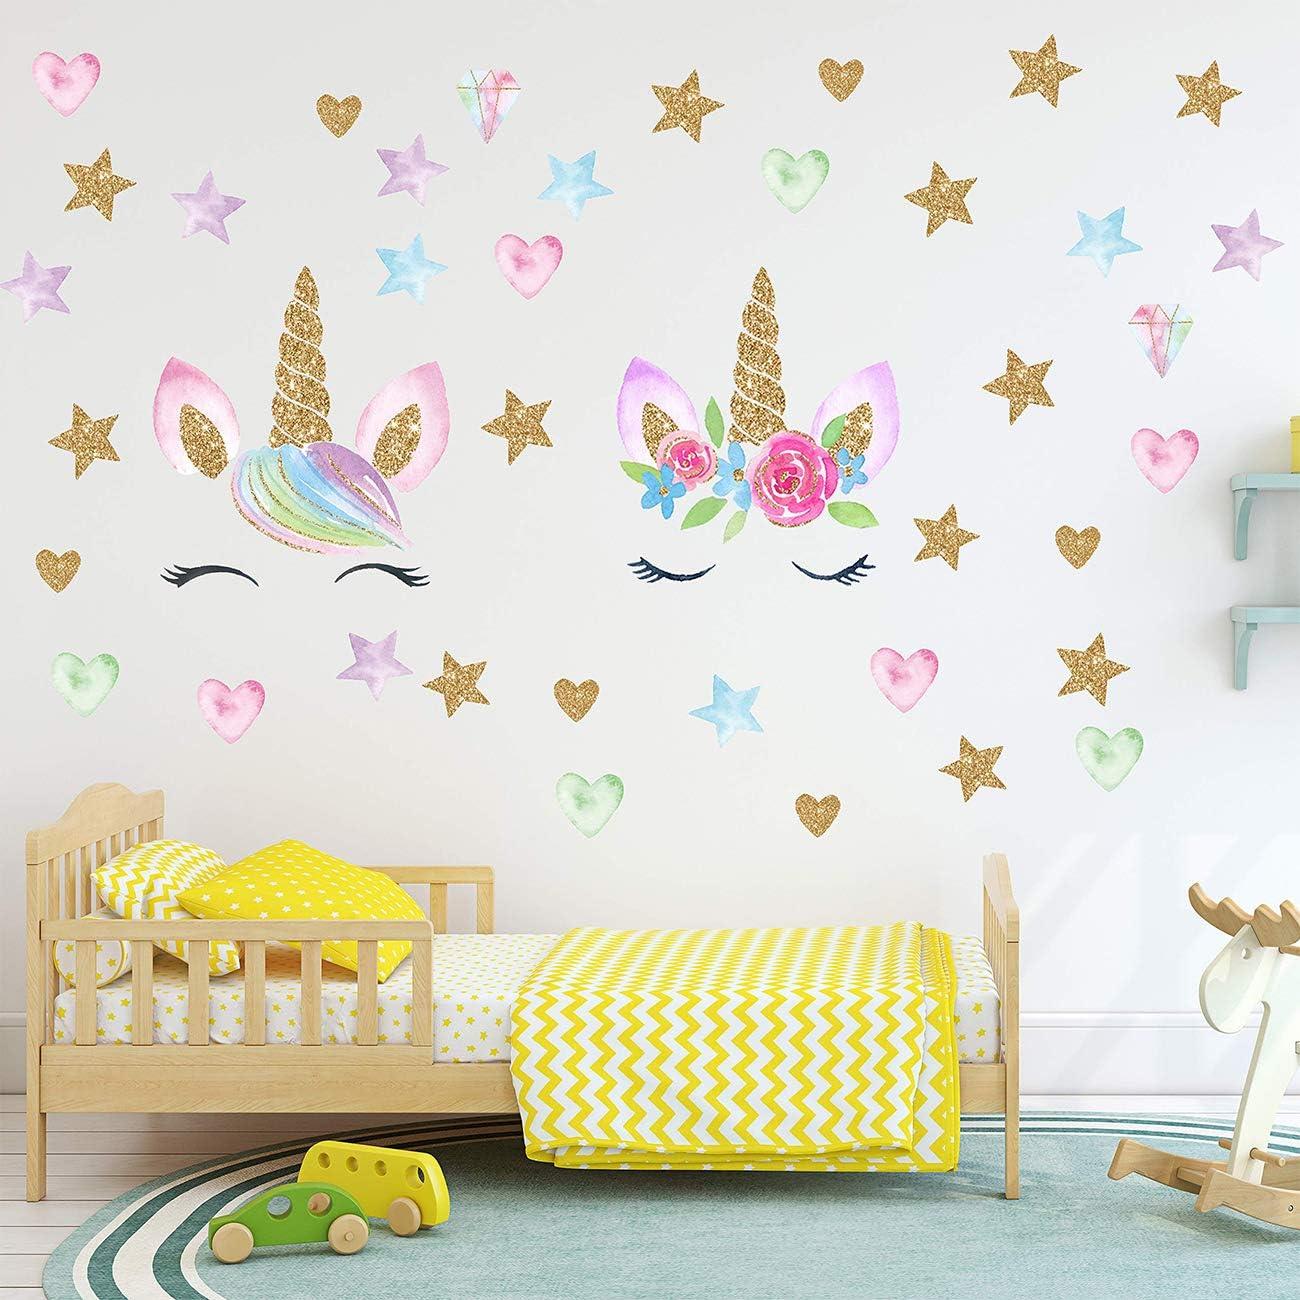 Beautiful Home Wall Art Sticker,2 Pack Unicorn Wall Decals Unicorn Wall Sticker Decor with Heart Flower Birthday Christmas Gifts for Boys Girls Kids Bedroom Decor Baby Nursery Room Home Decor